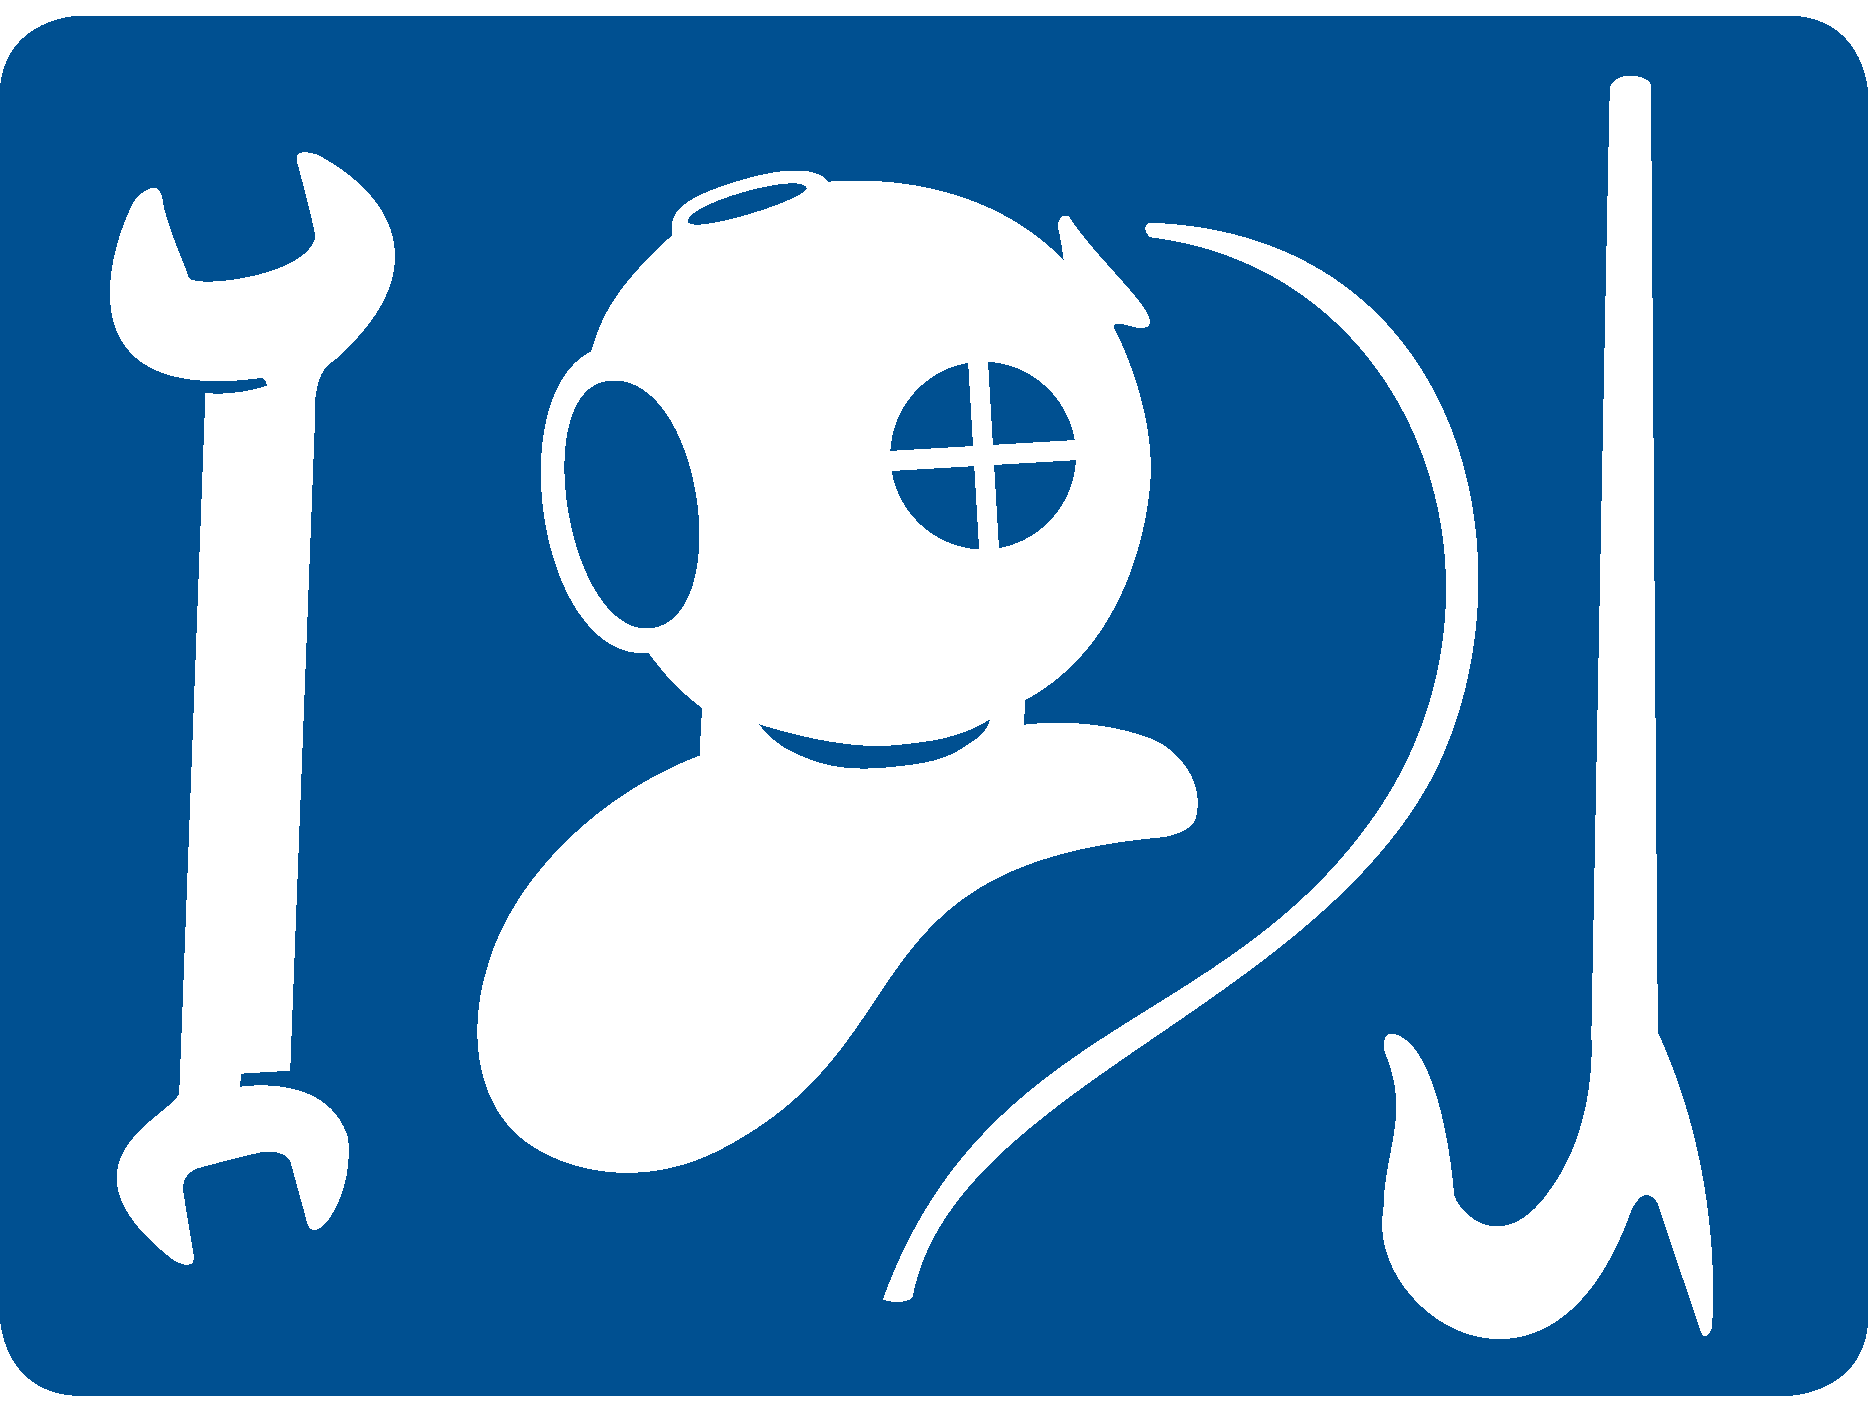 https://www.krietemeier.de/wp-content/uploads/2020/08/Logo_Krietemeier_NEU.png